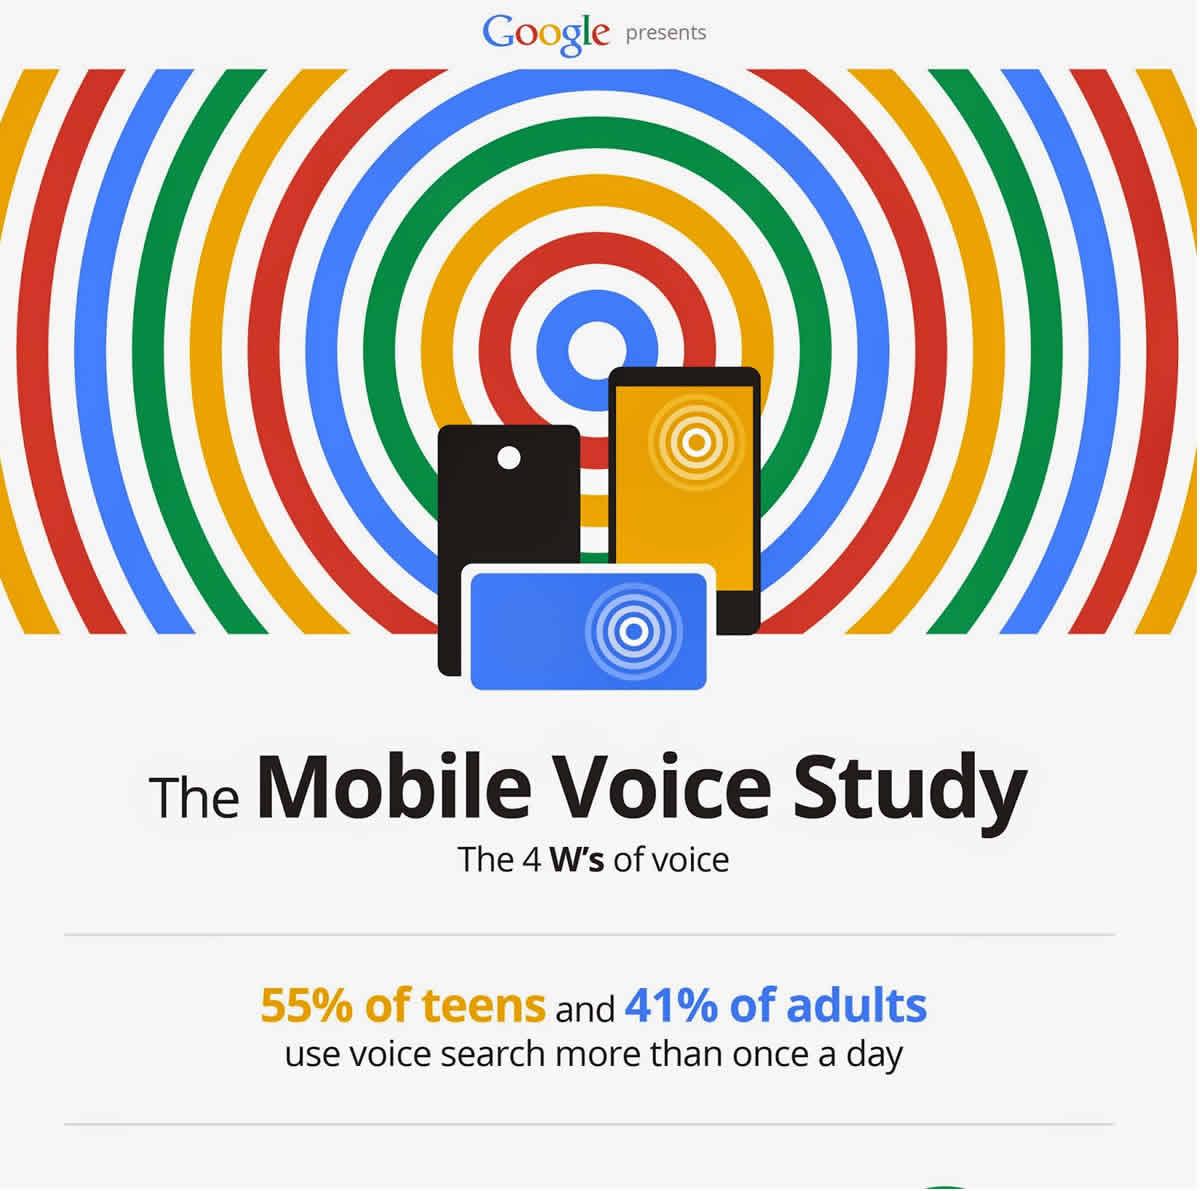 Mobile Voice Study